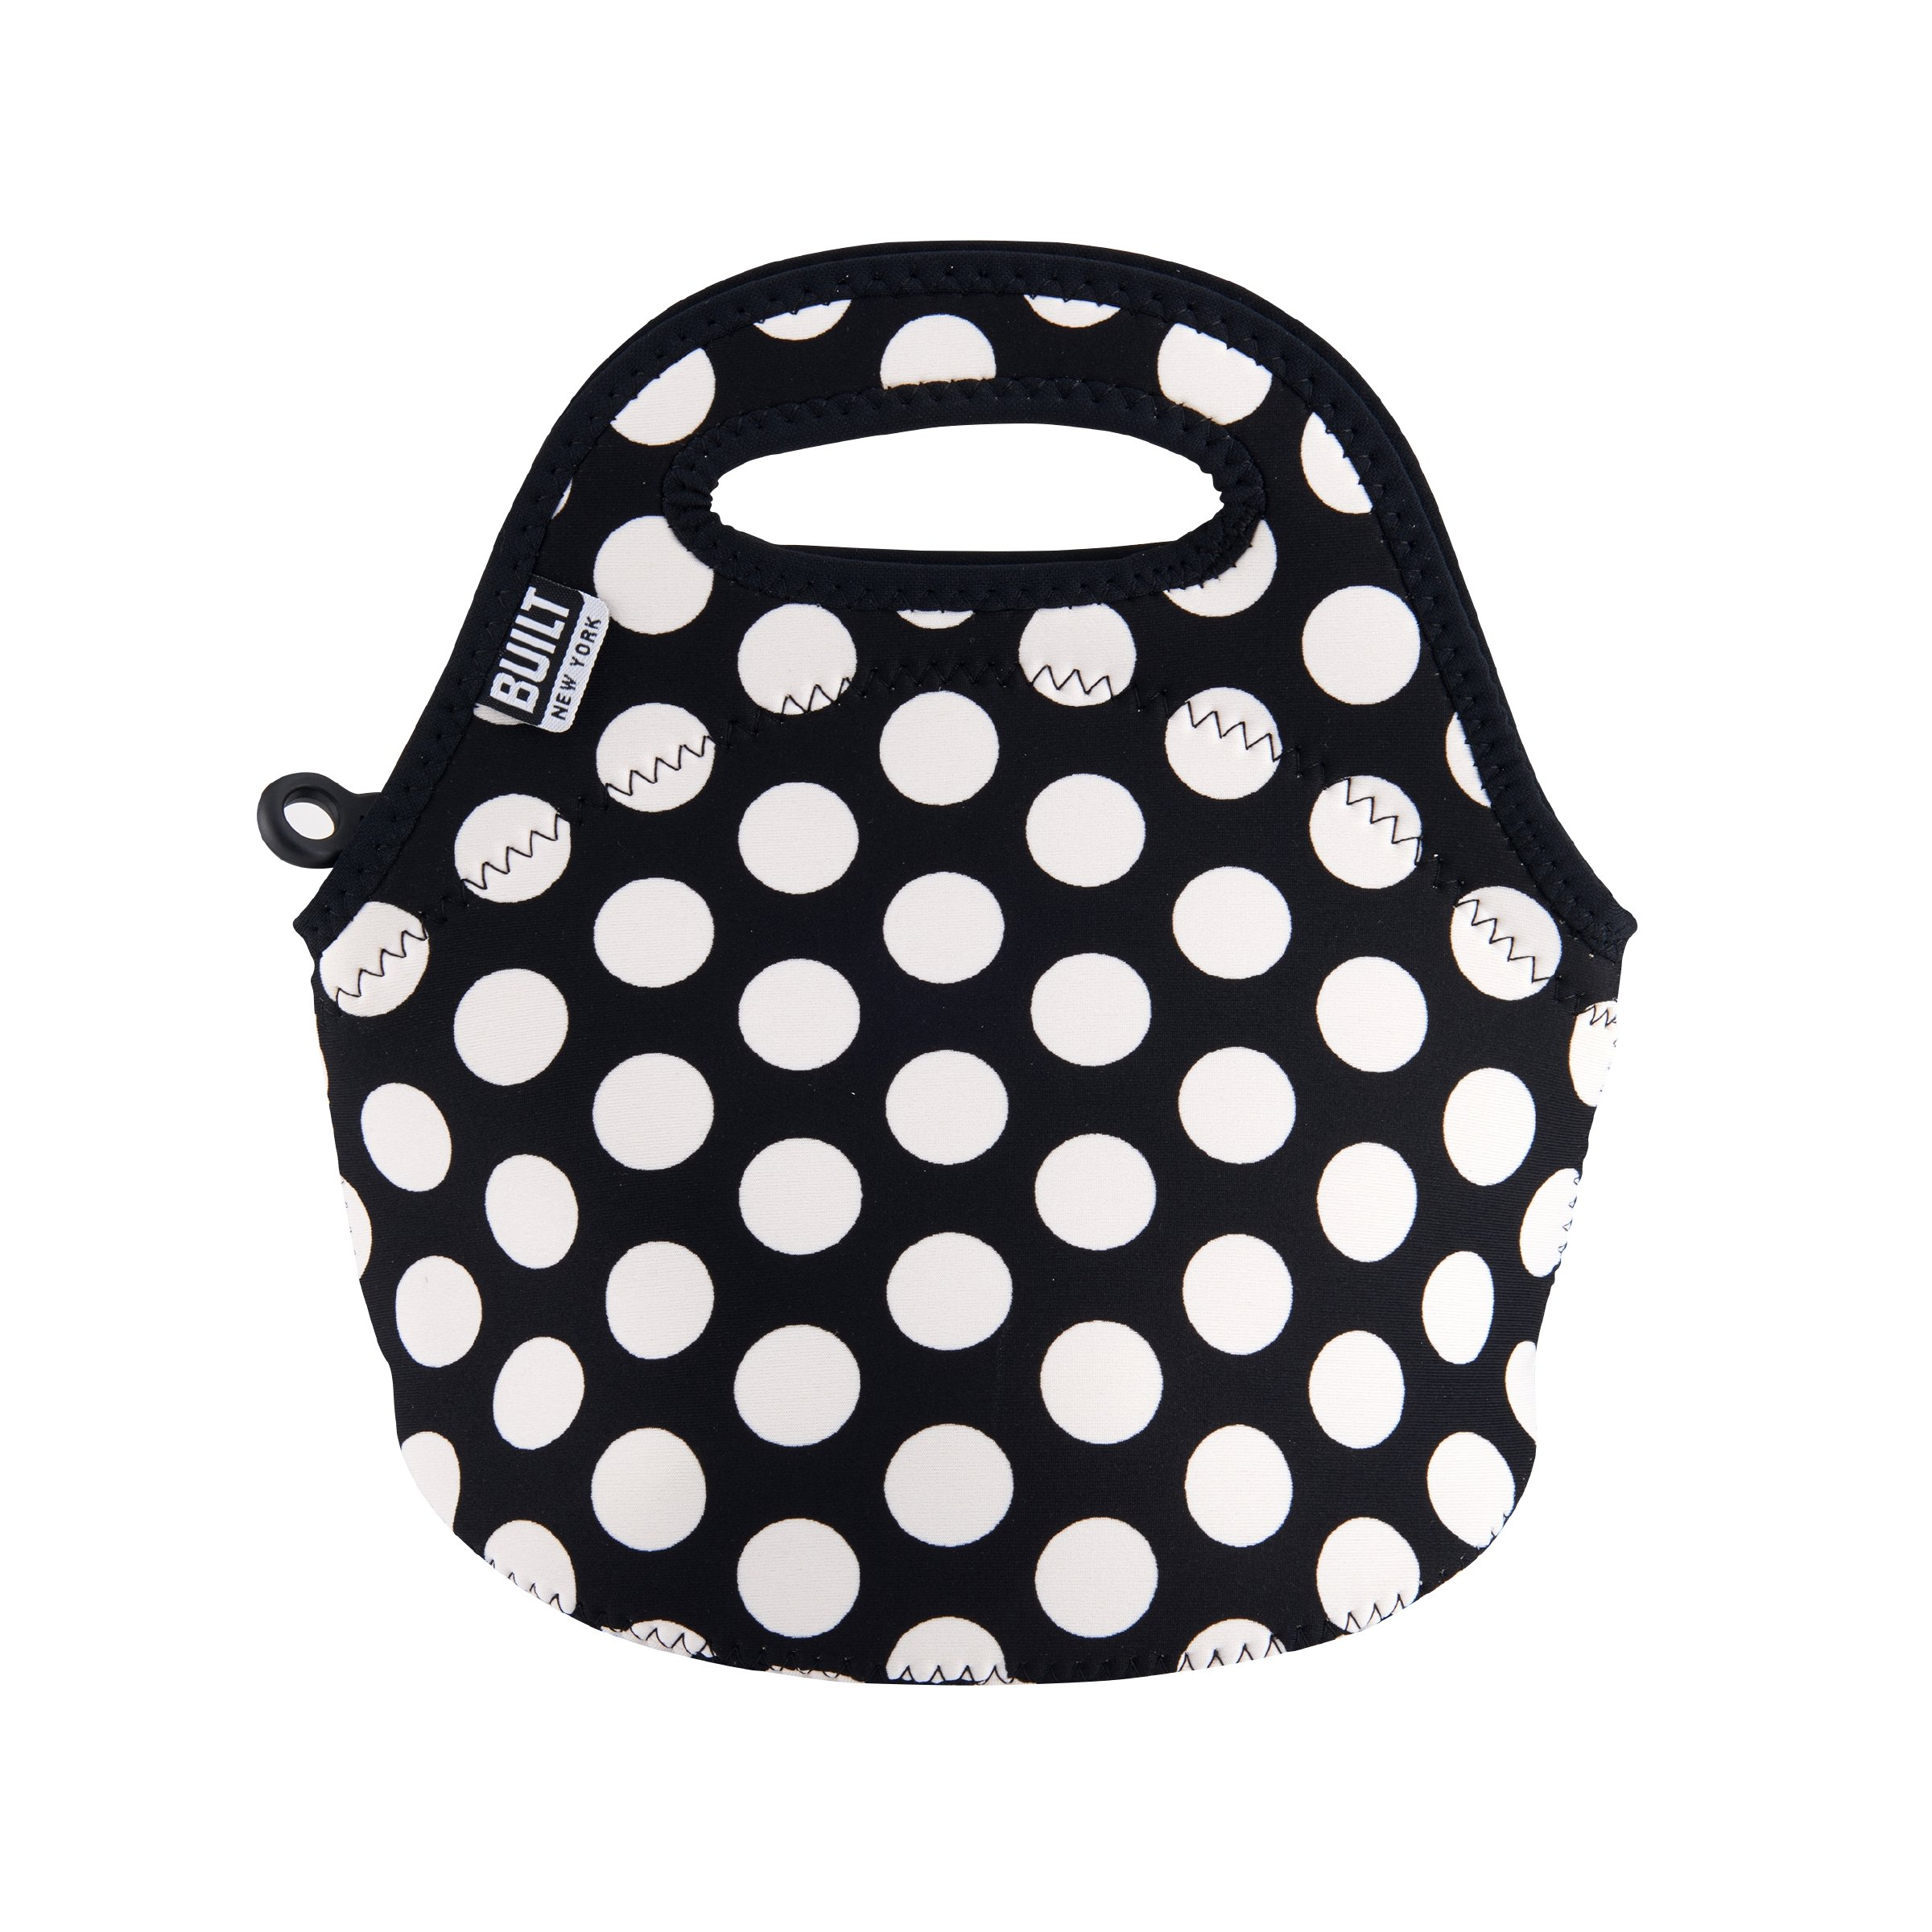 Built NY LB10-BBW Gourmet Getaway Mini Lightweight Insulated Neoprene Lunch Tote Bag, Big Dot Black & White